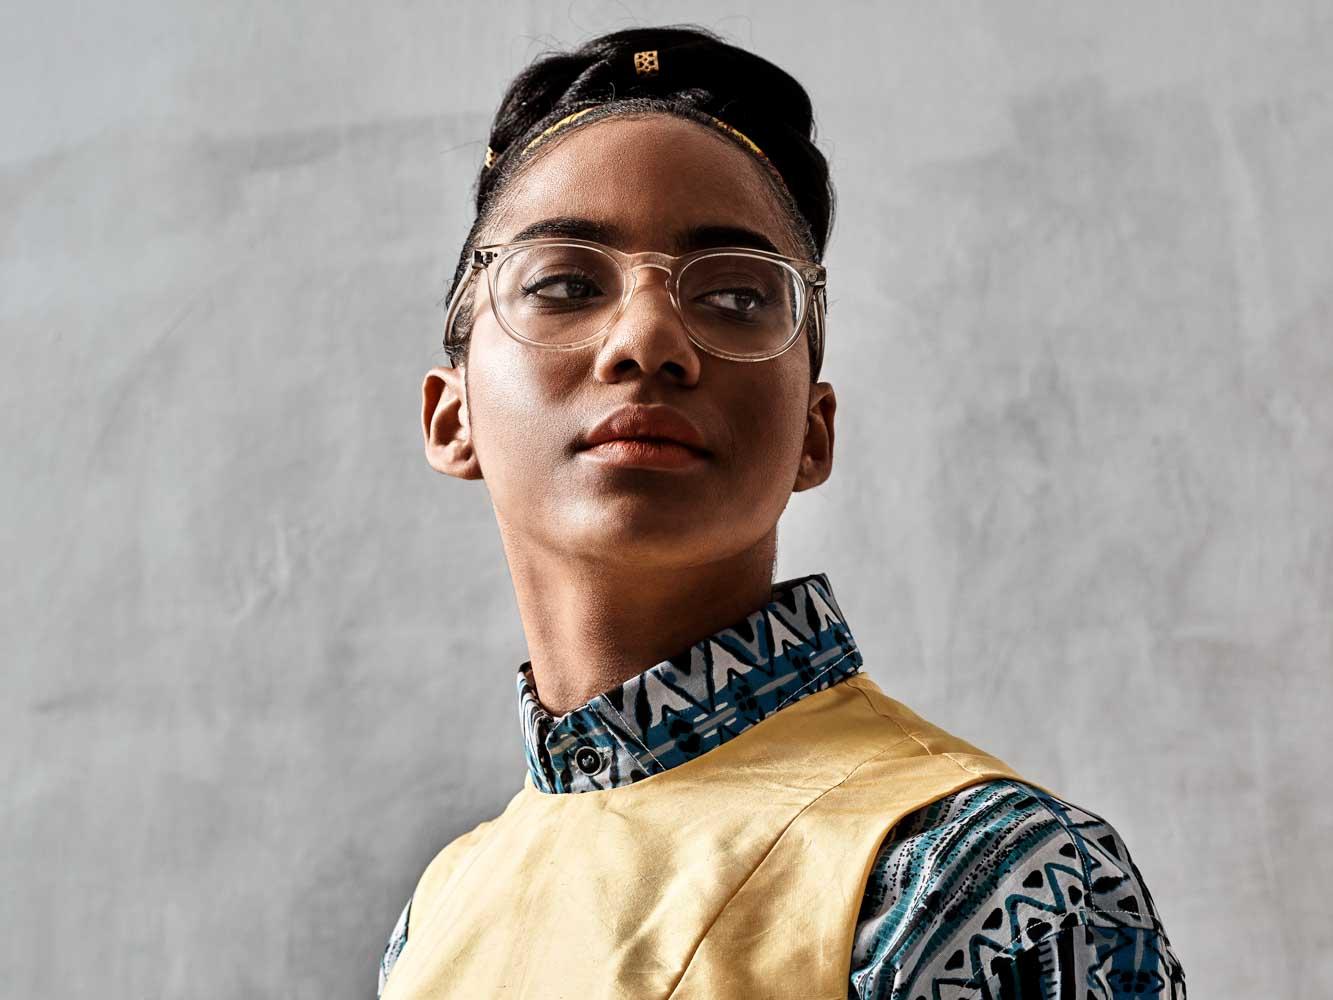 corporate_daniel_kummer-new_afro_2019-03